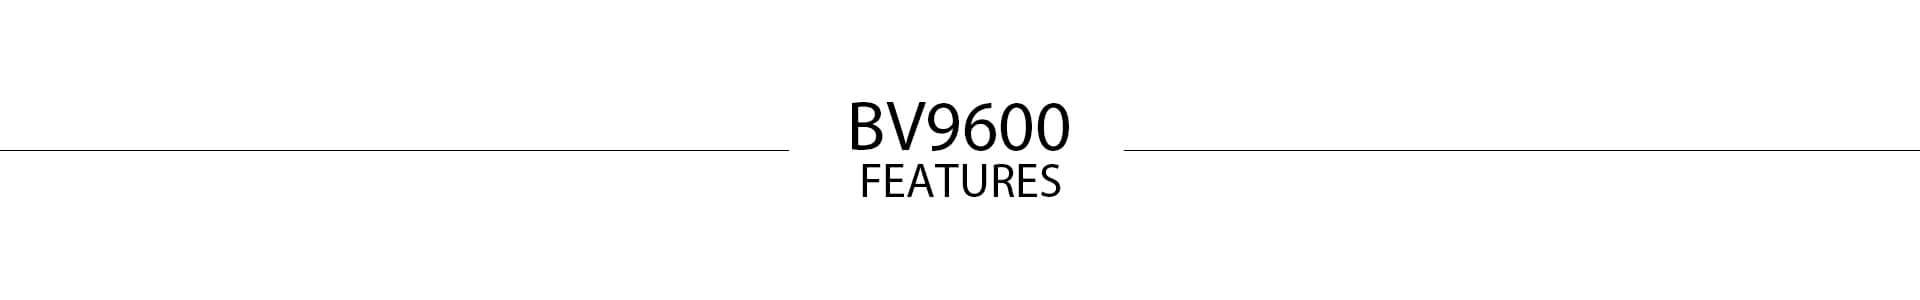 BV9600